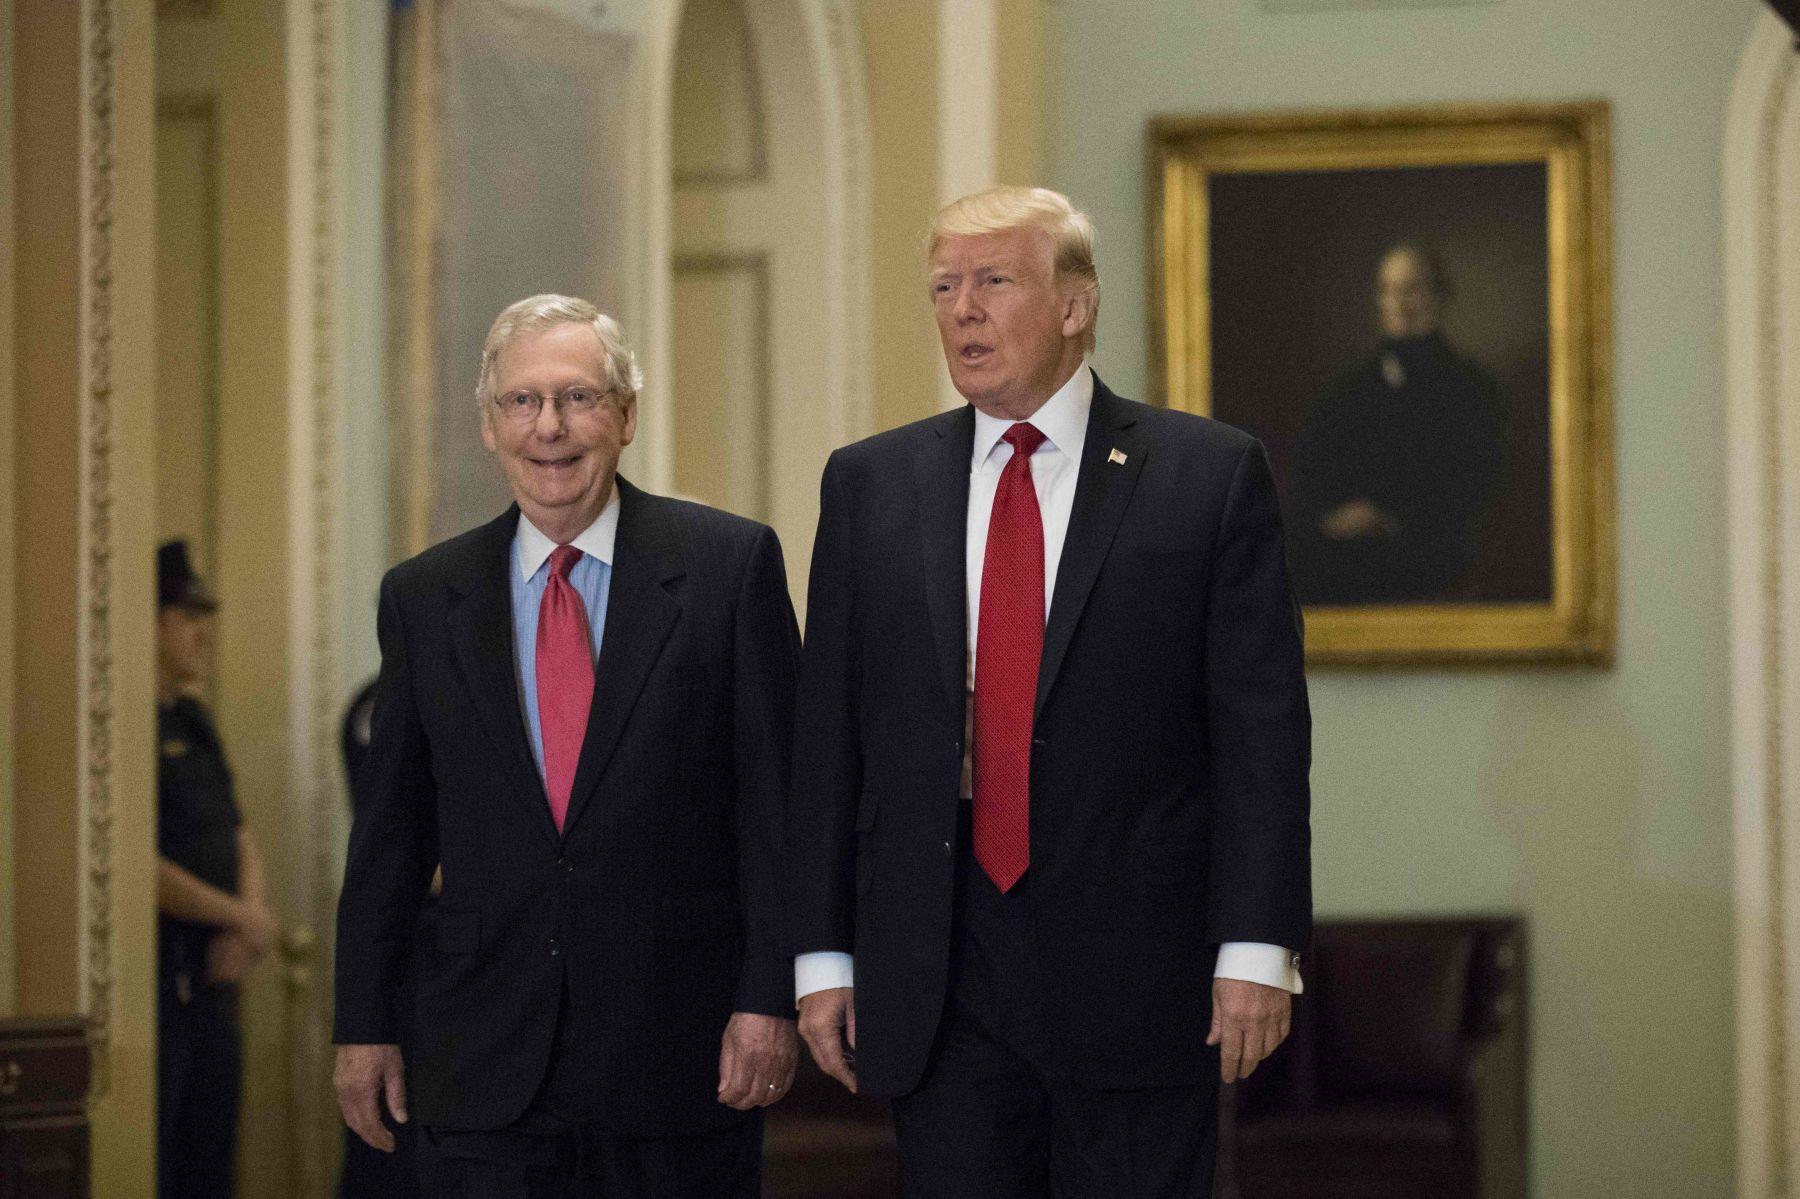 Drew Angerer/GETTY IMAGES NORTH AMERICA/AFP